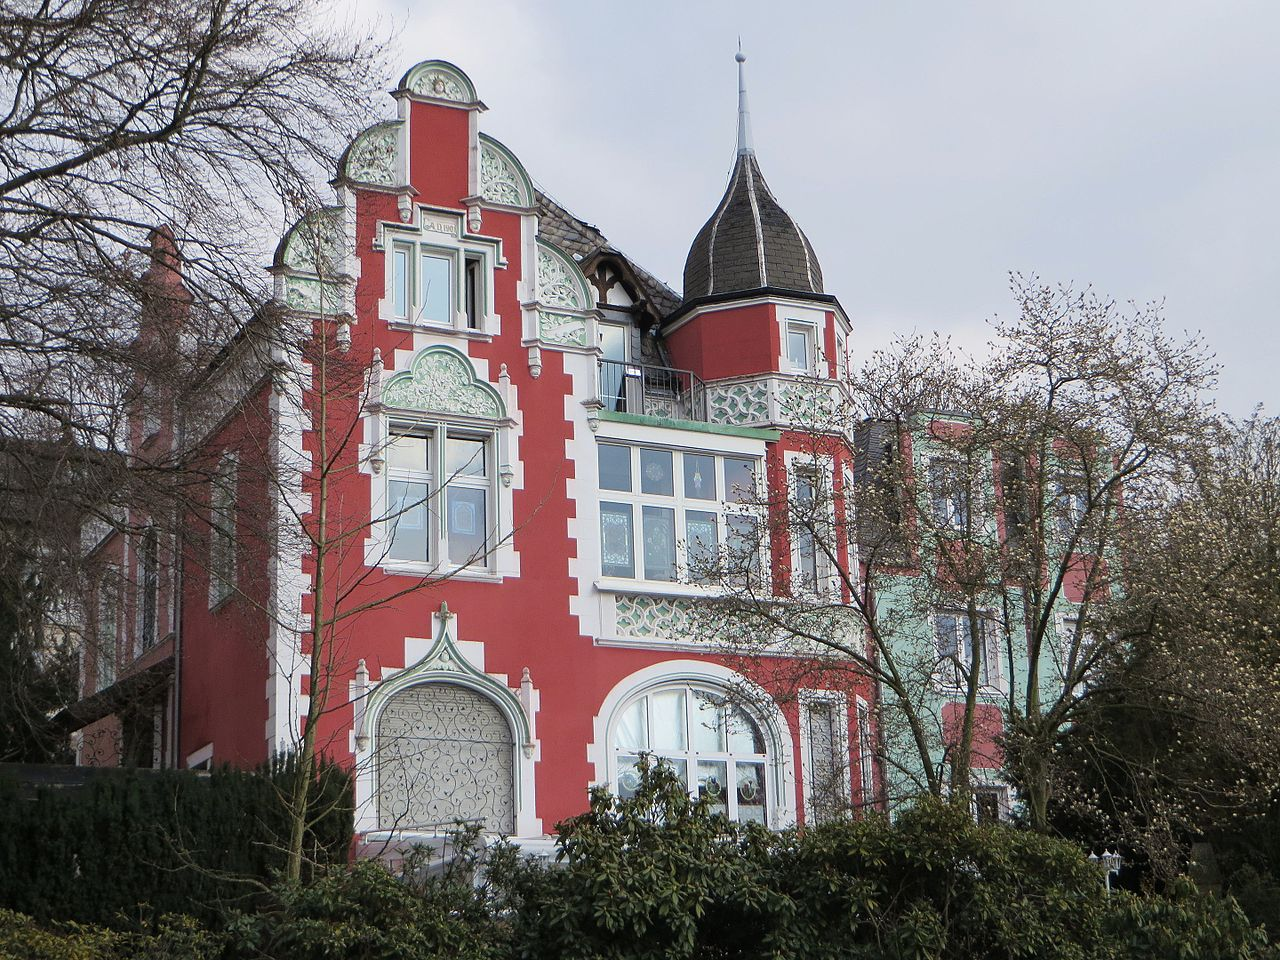 Villa De St Laurent